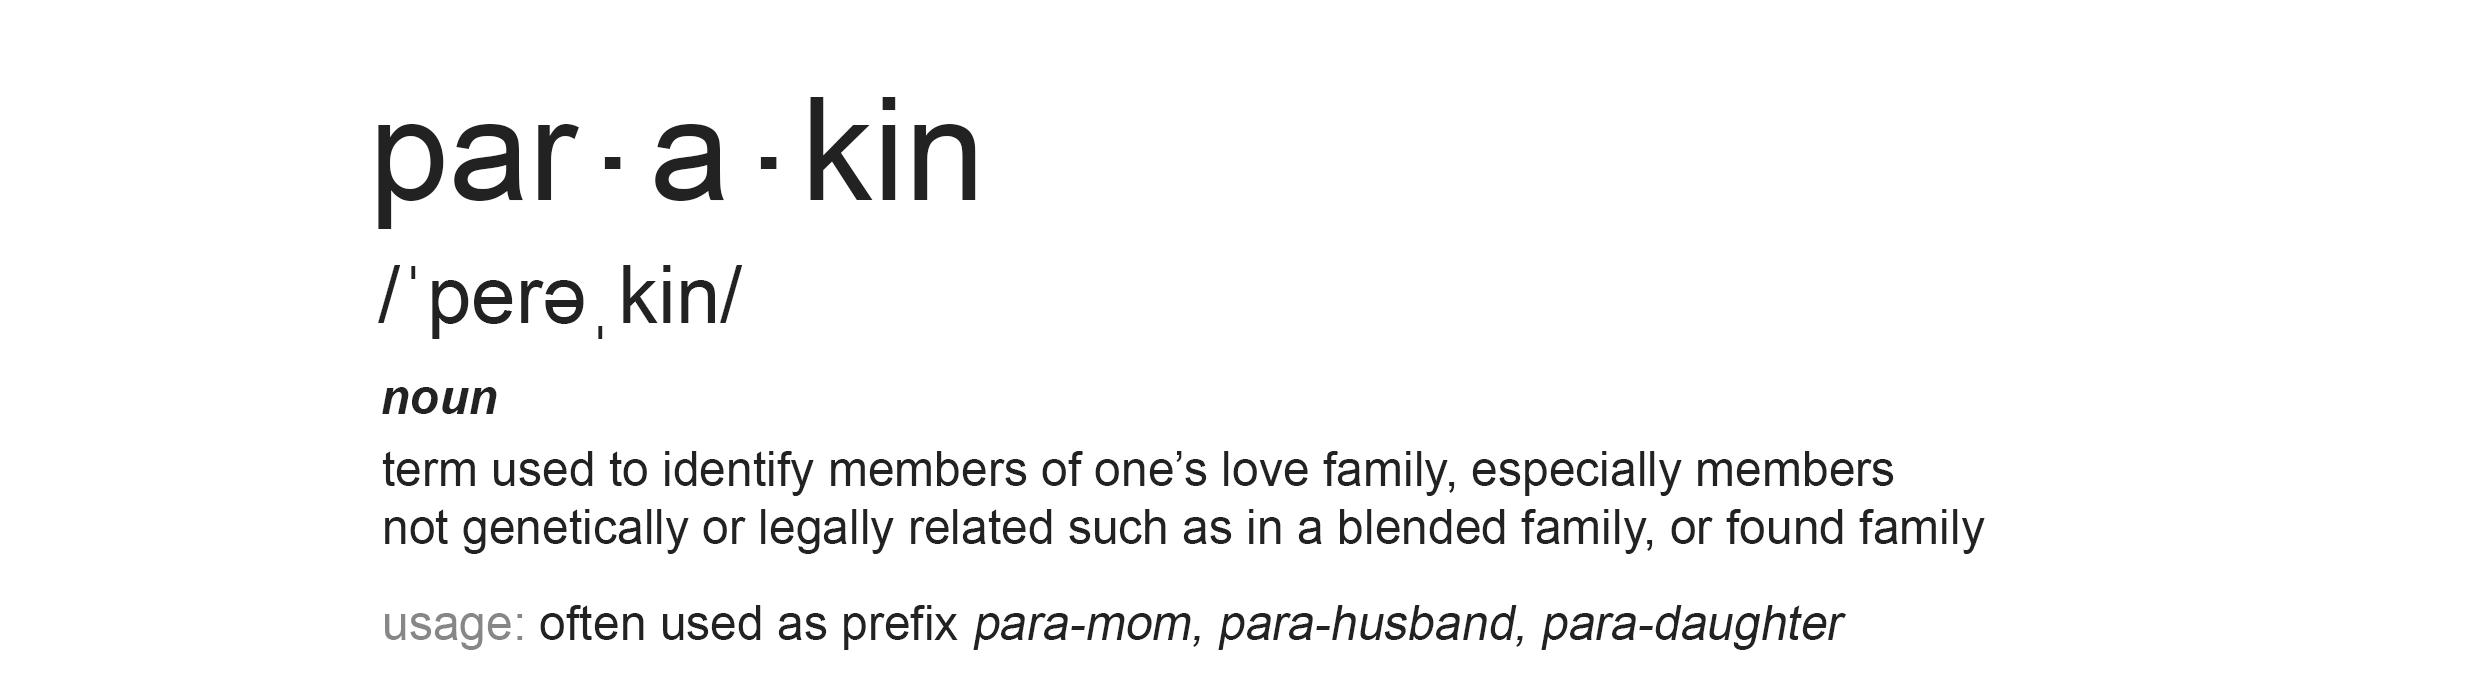 para kin definition